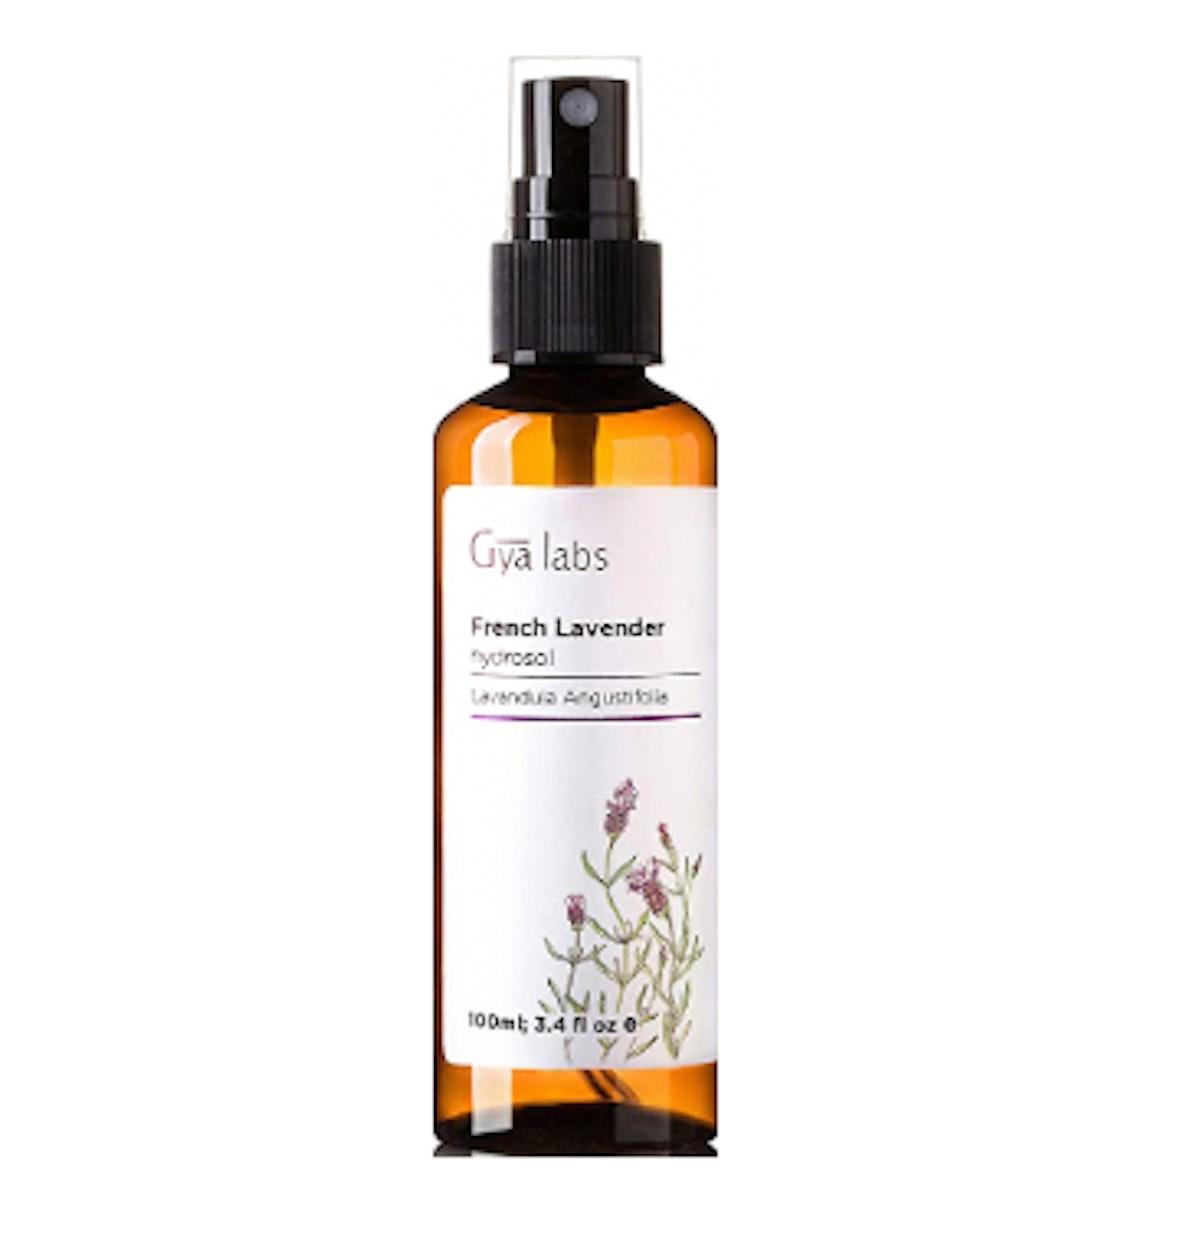 Gya Labs Lavender Spray